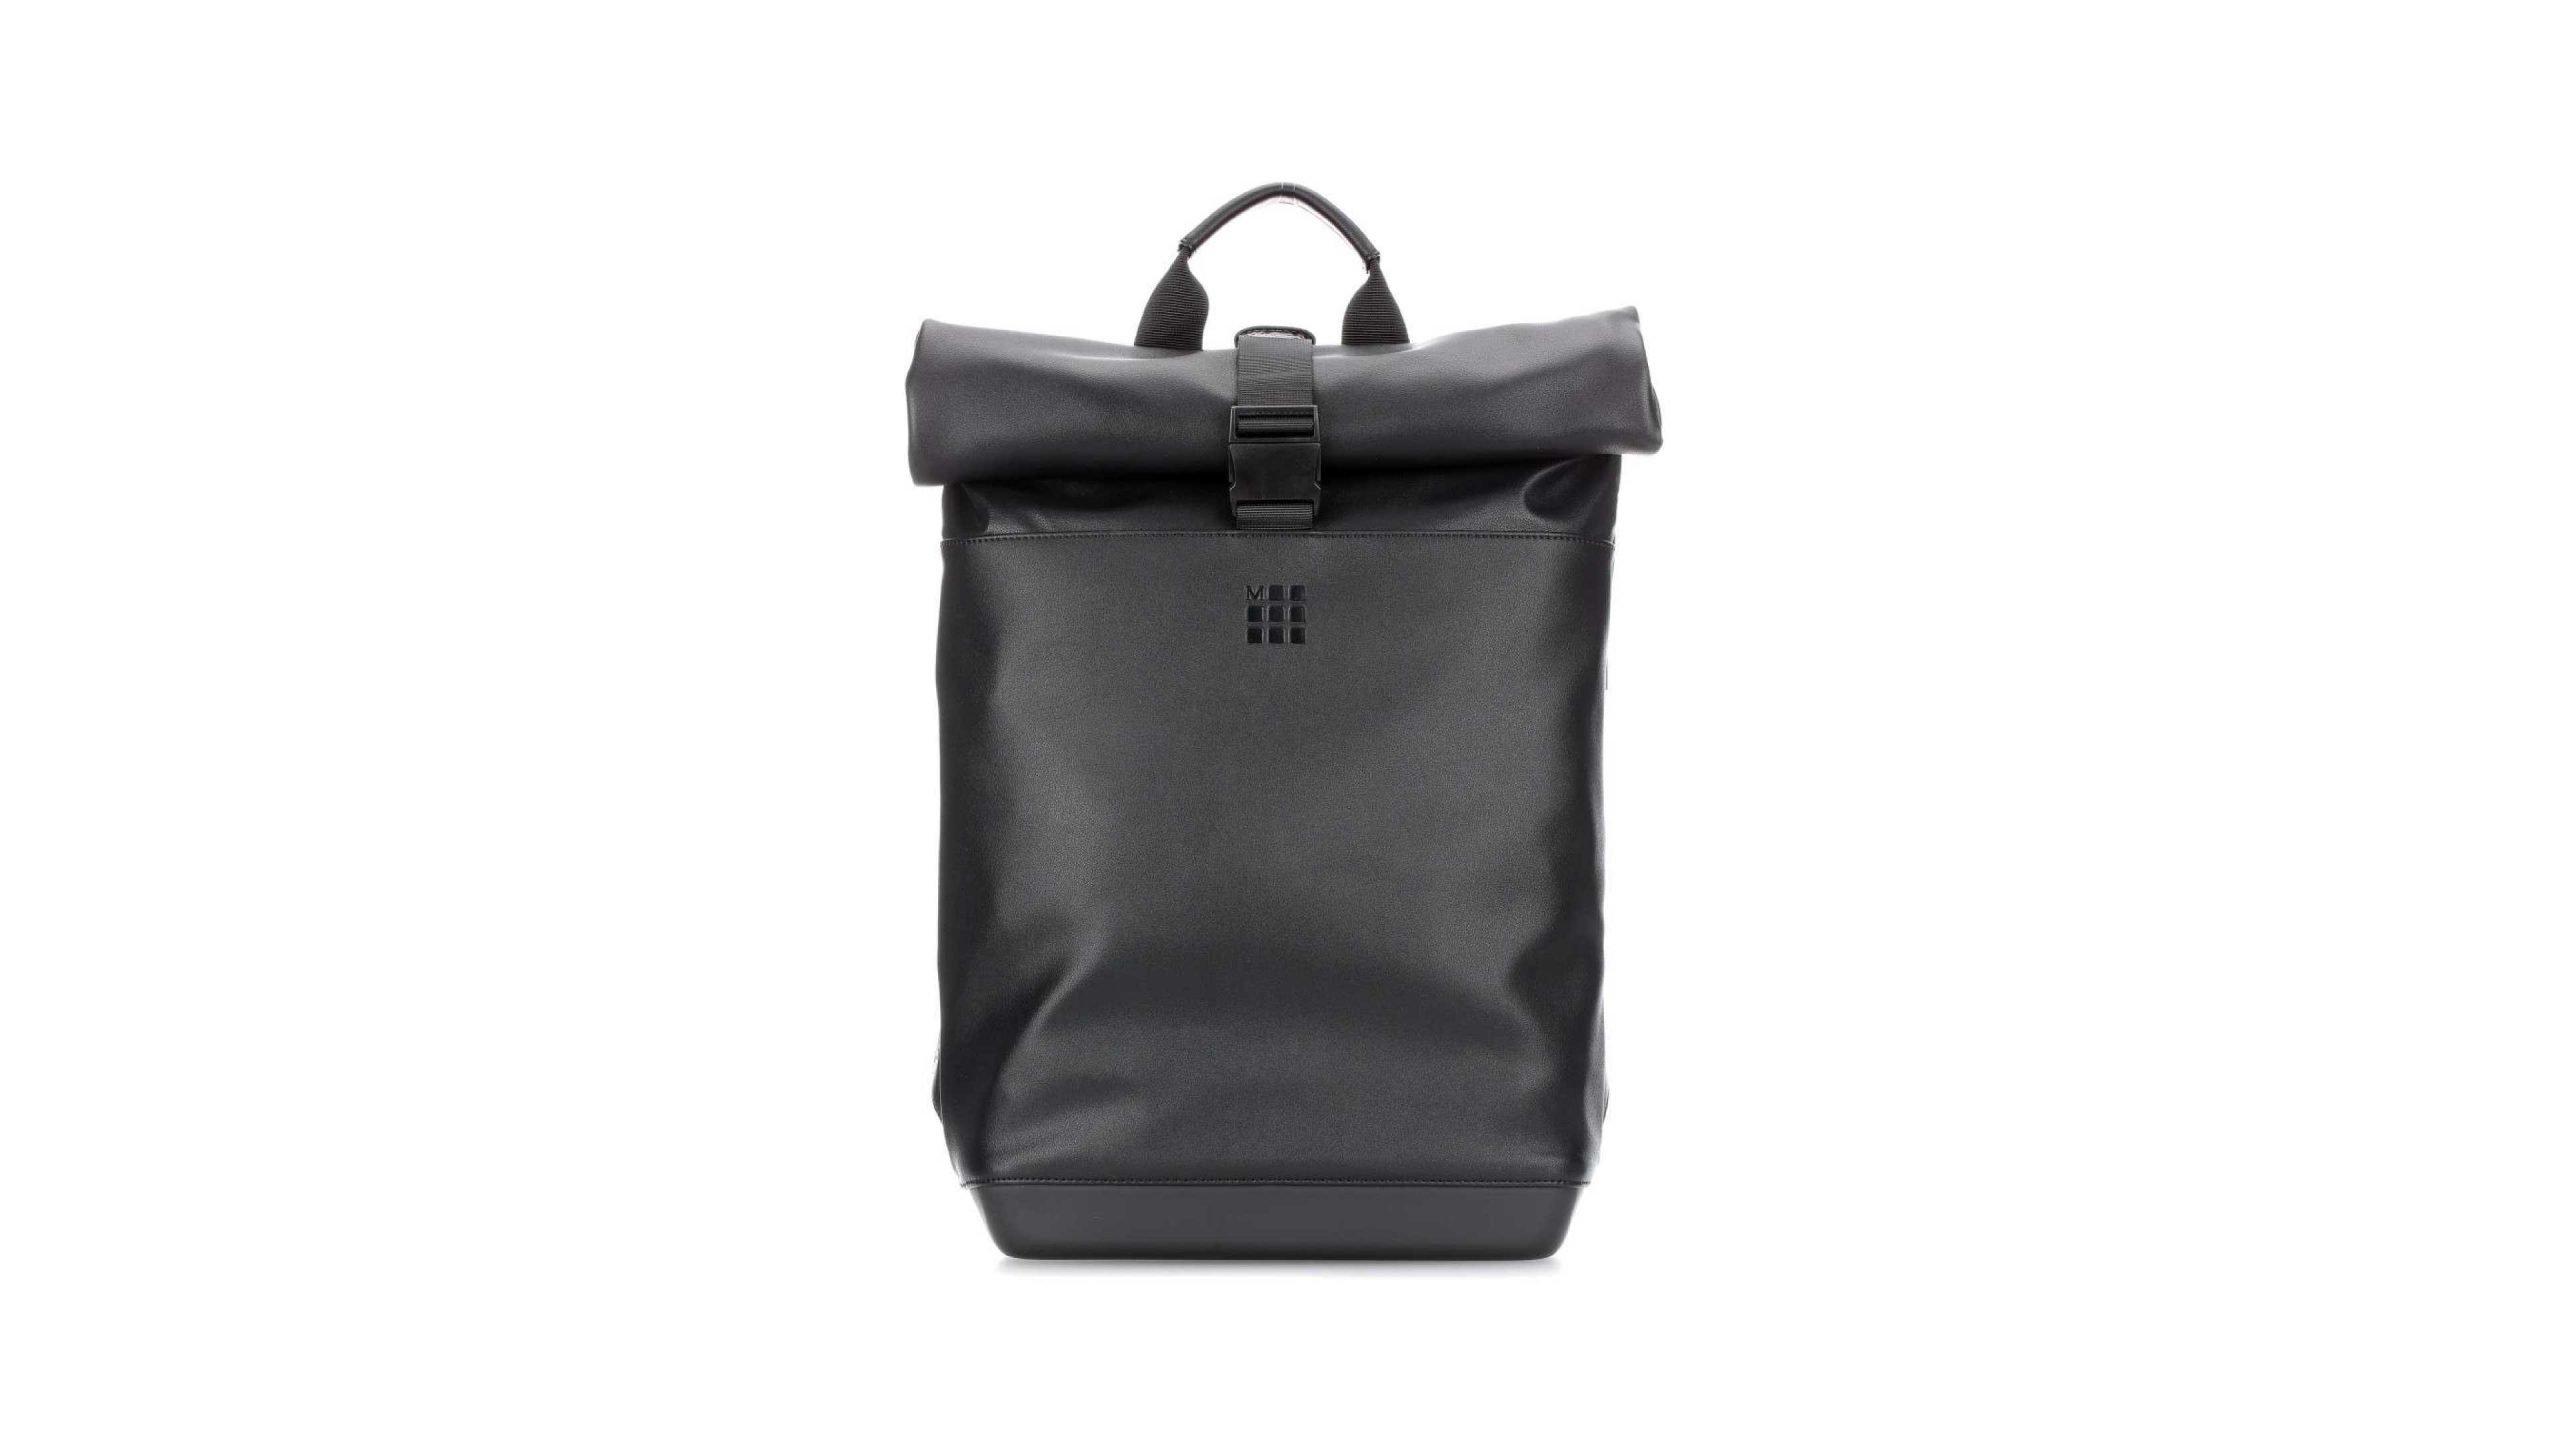 MOLESKINE-product-branding-02